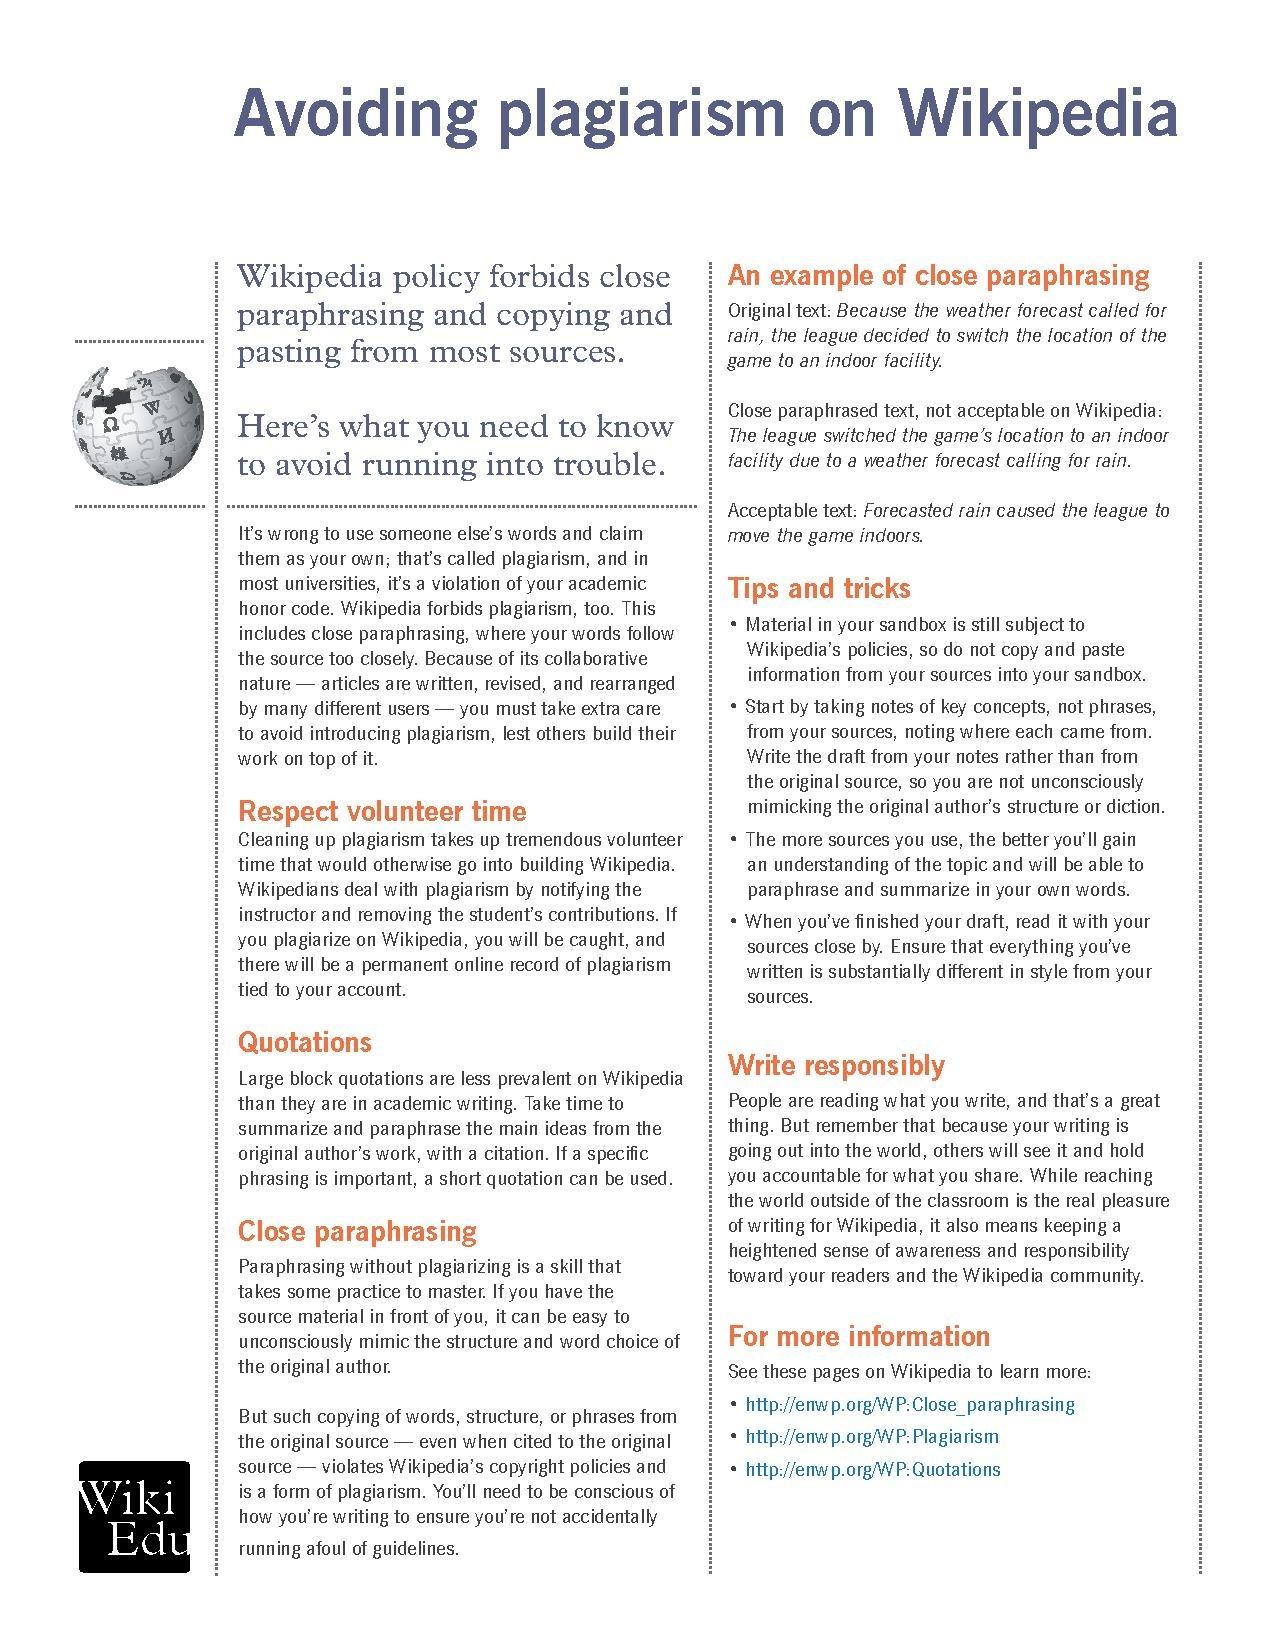 wikipedia advice on writing original content